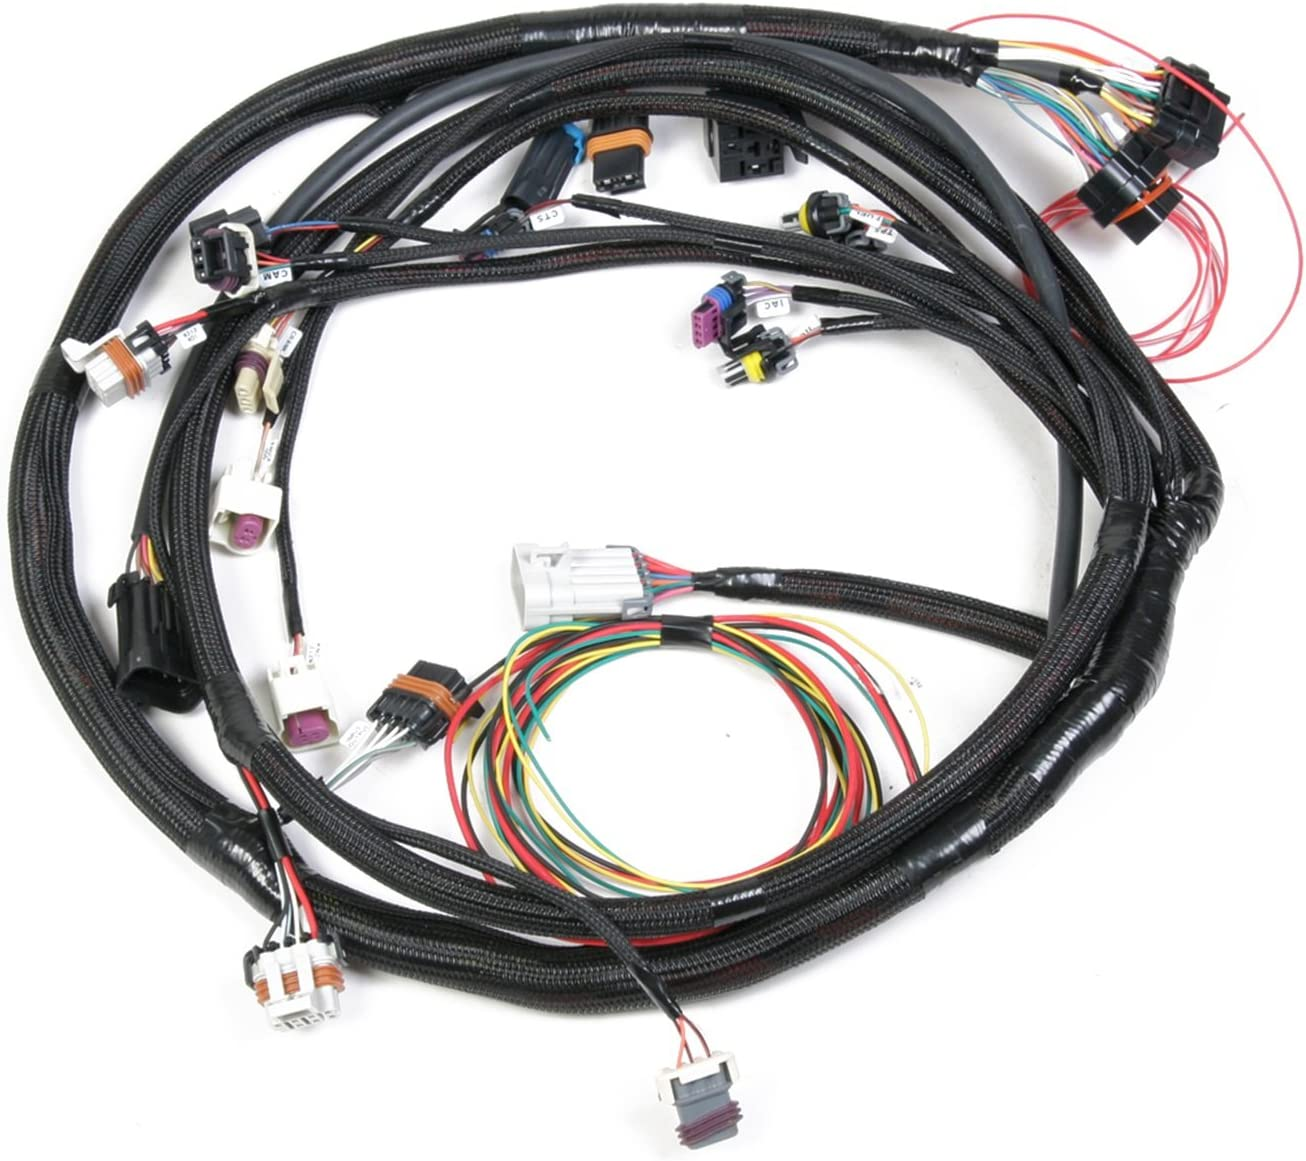 Amazon.com: Holley 558-103 LS2 Main Harness: AutomotiveAmazon.com